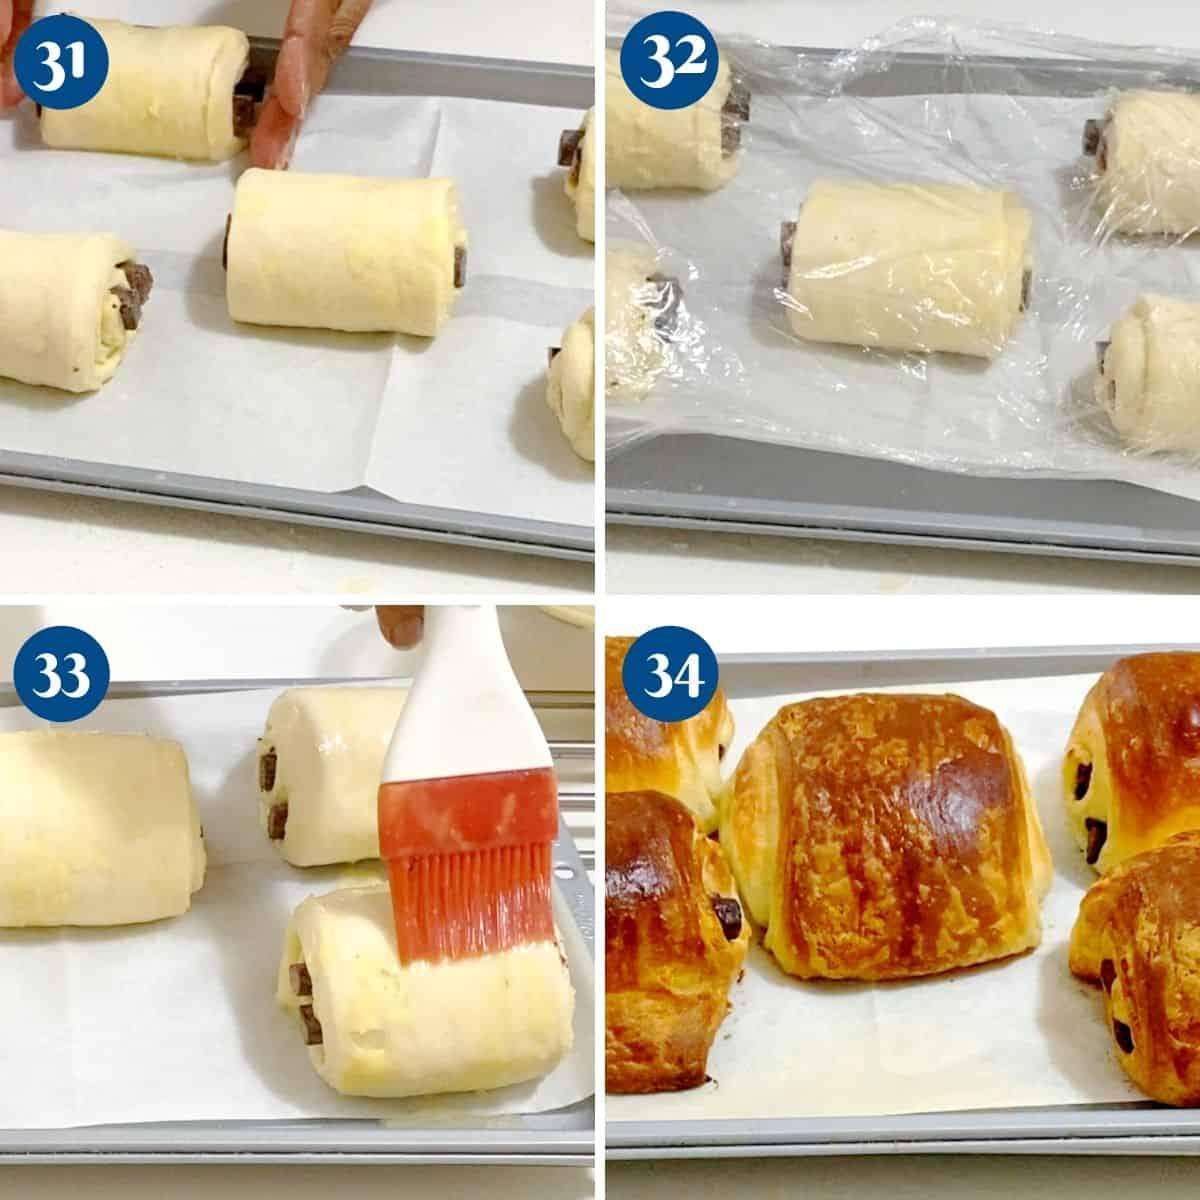 Progress pictures collage baking the croissants.